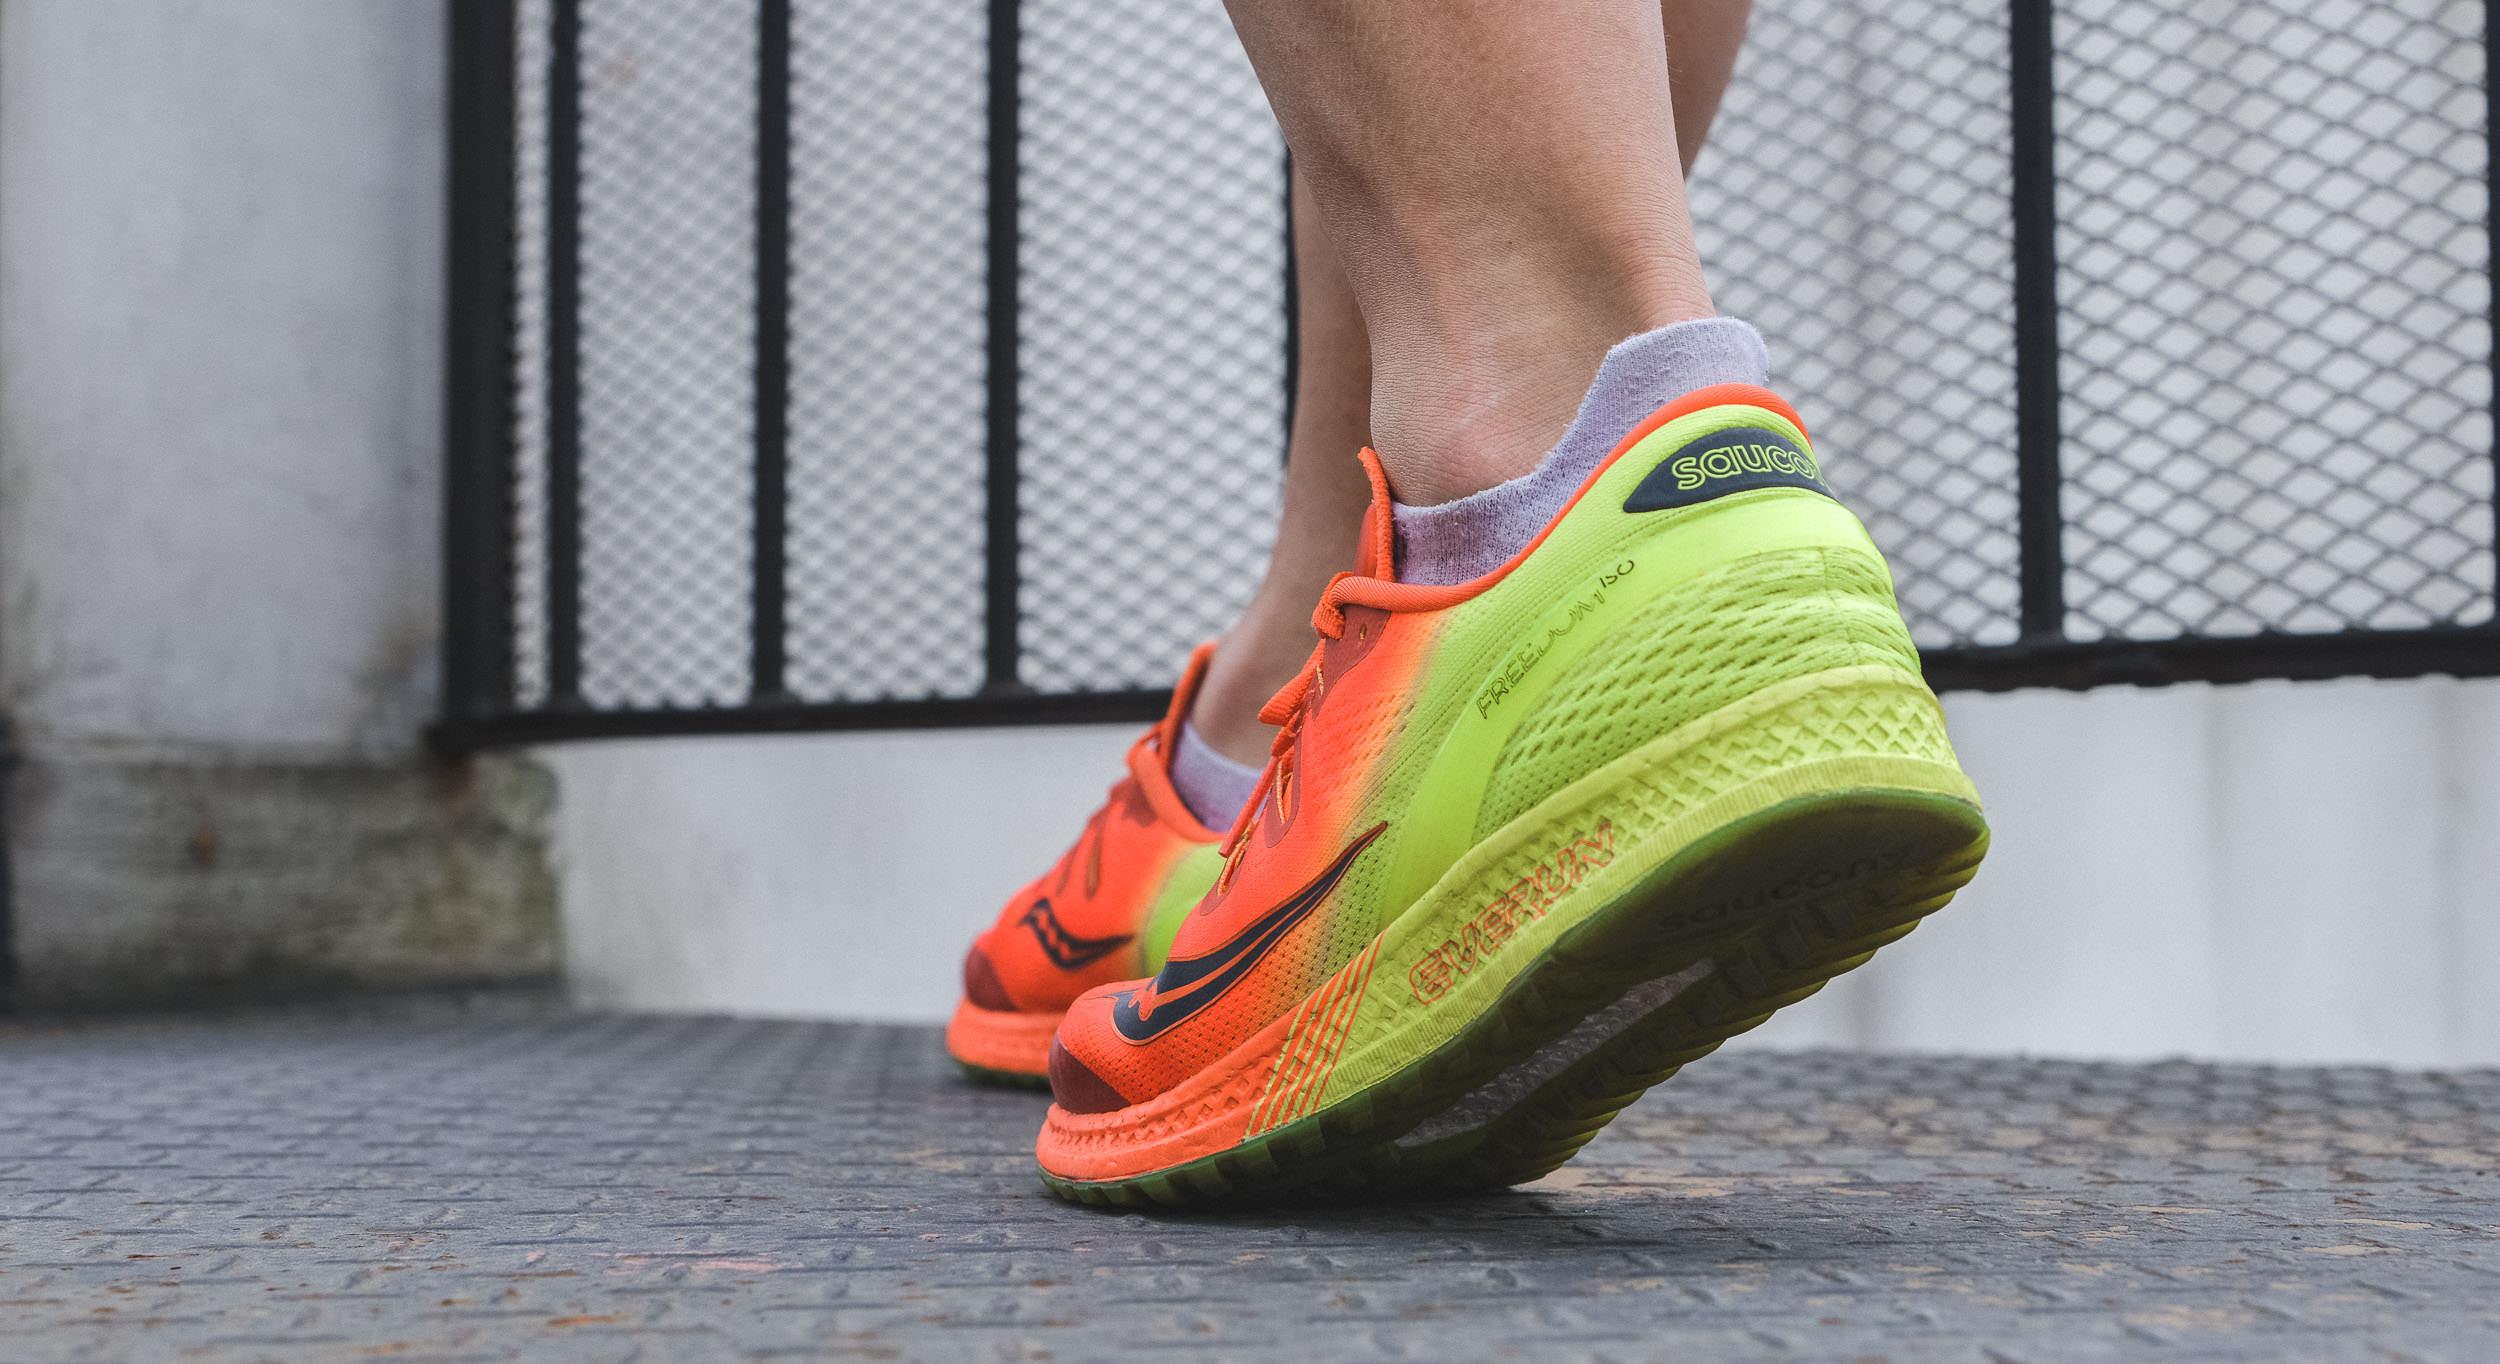 跑鞋 | 脚感优秀值得入手 Saucony Freedom ISO深度评测